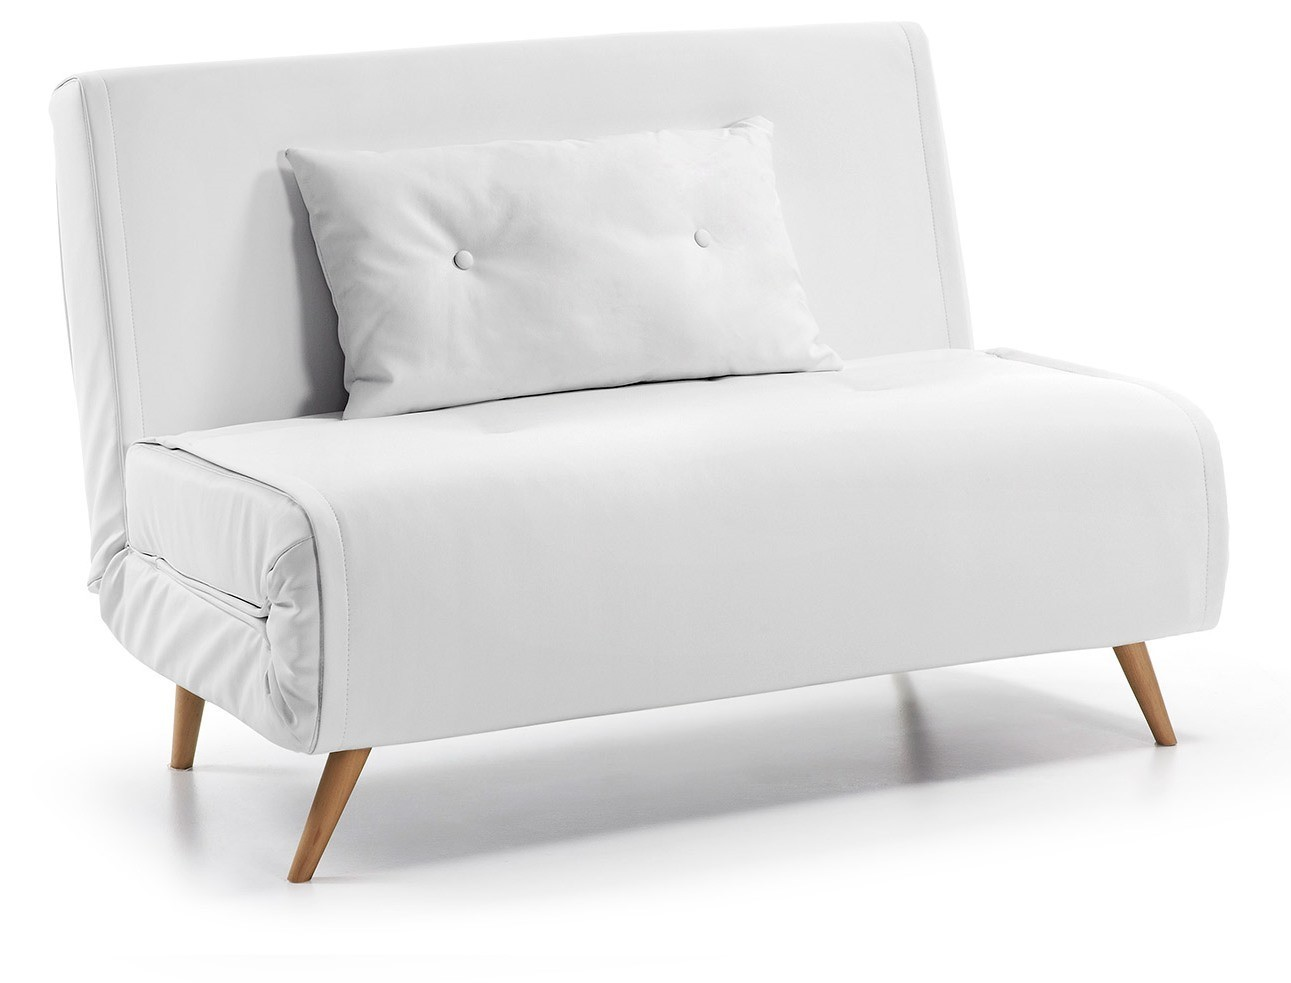 tulip convertible sofa bed from 100 cm white faux leather ... - Pelle Bianca Divano Letto Semplice